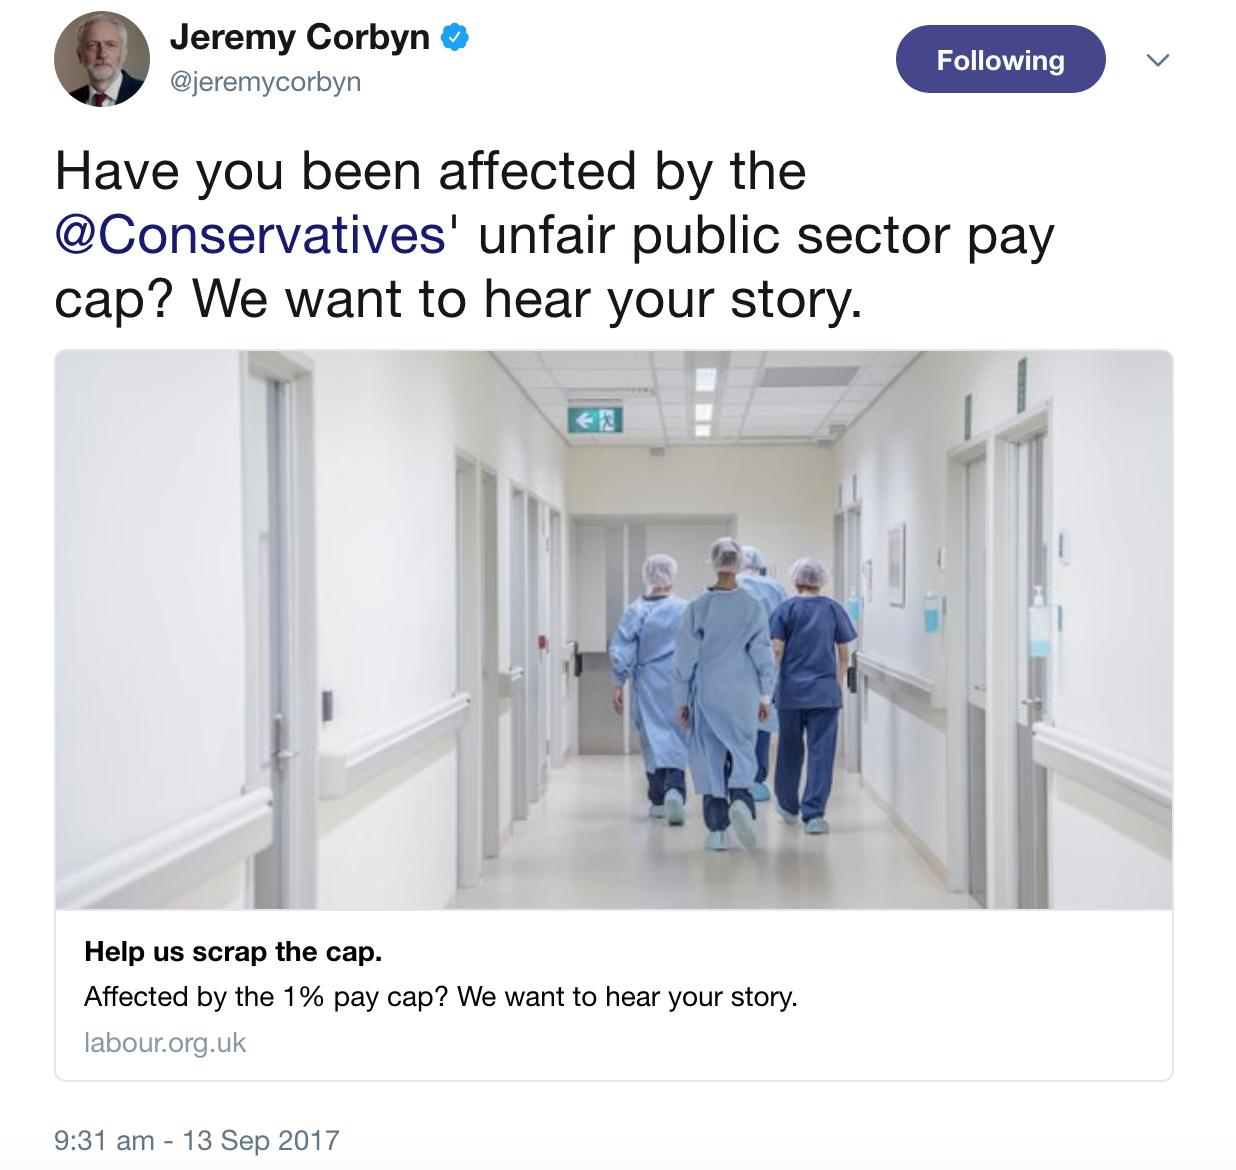 Corbyn Public Sector Pay Cap